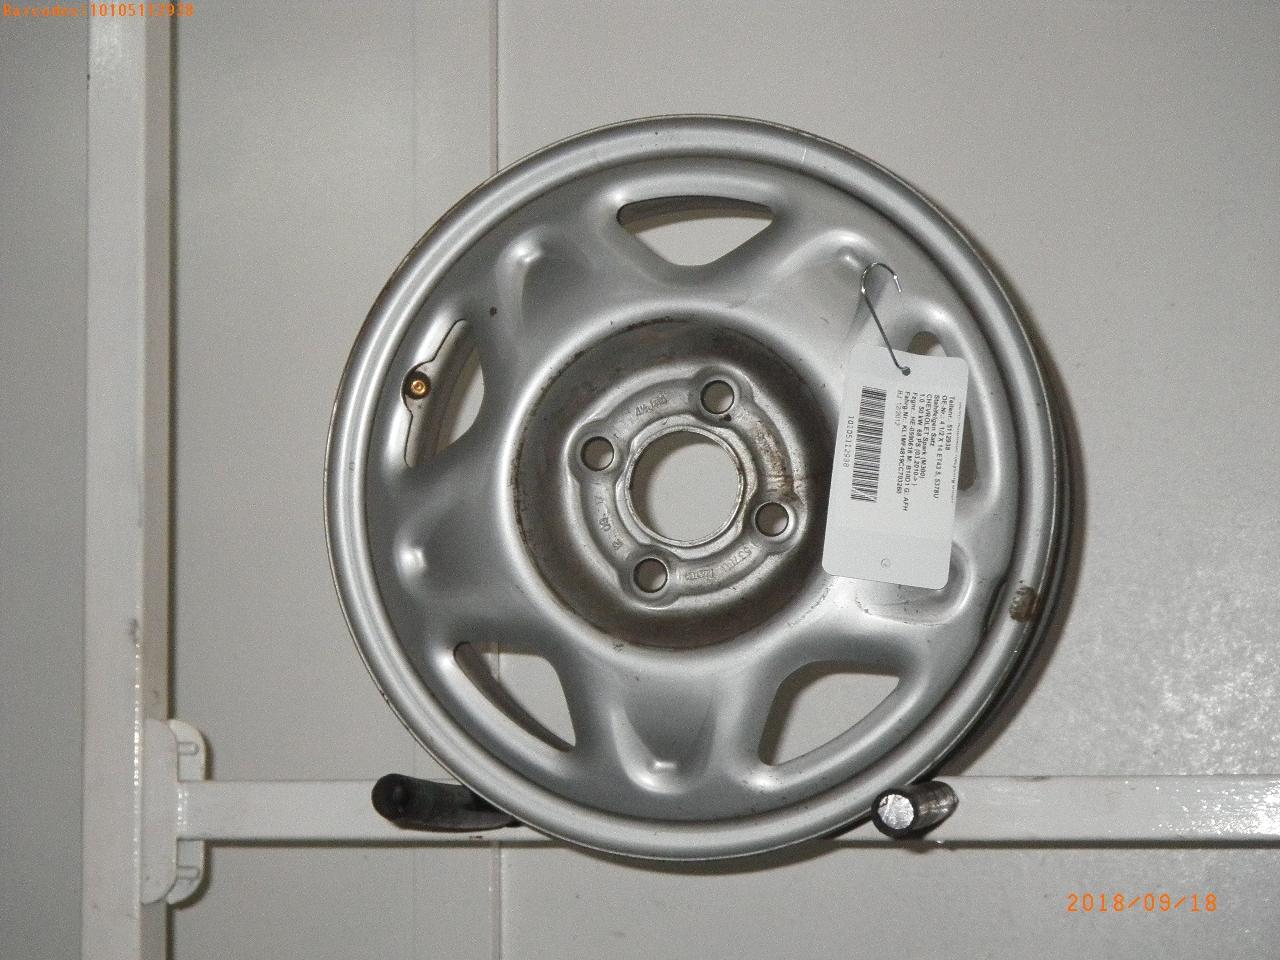 Rim Chevrolet Spark M300 1 0 4 1 2 X 14 Et43 5 Sonstige 5378u Austem B Parts